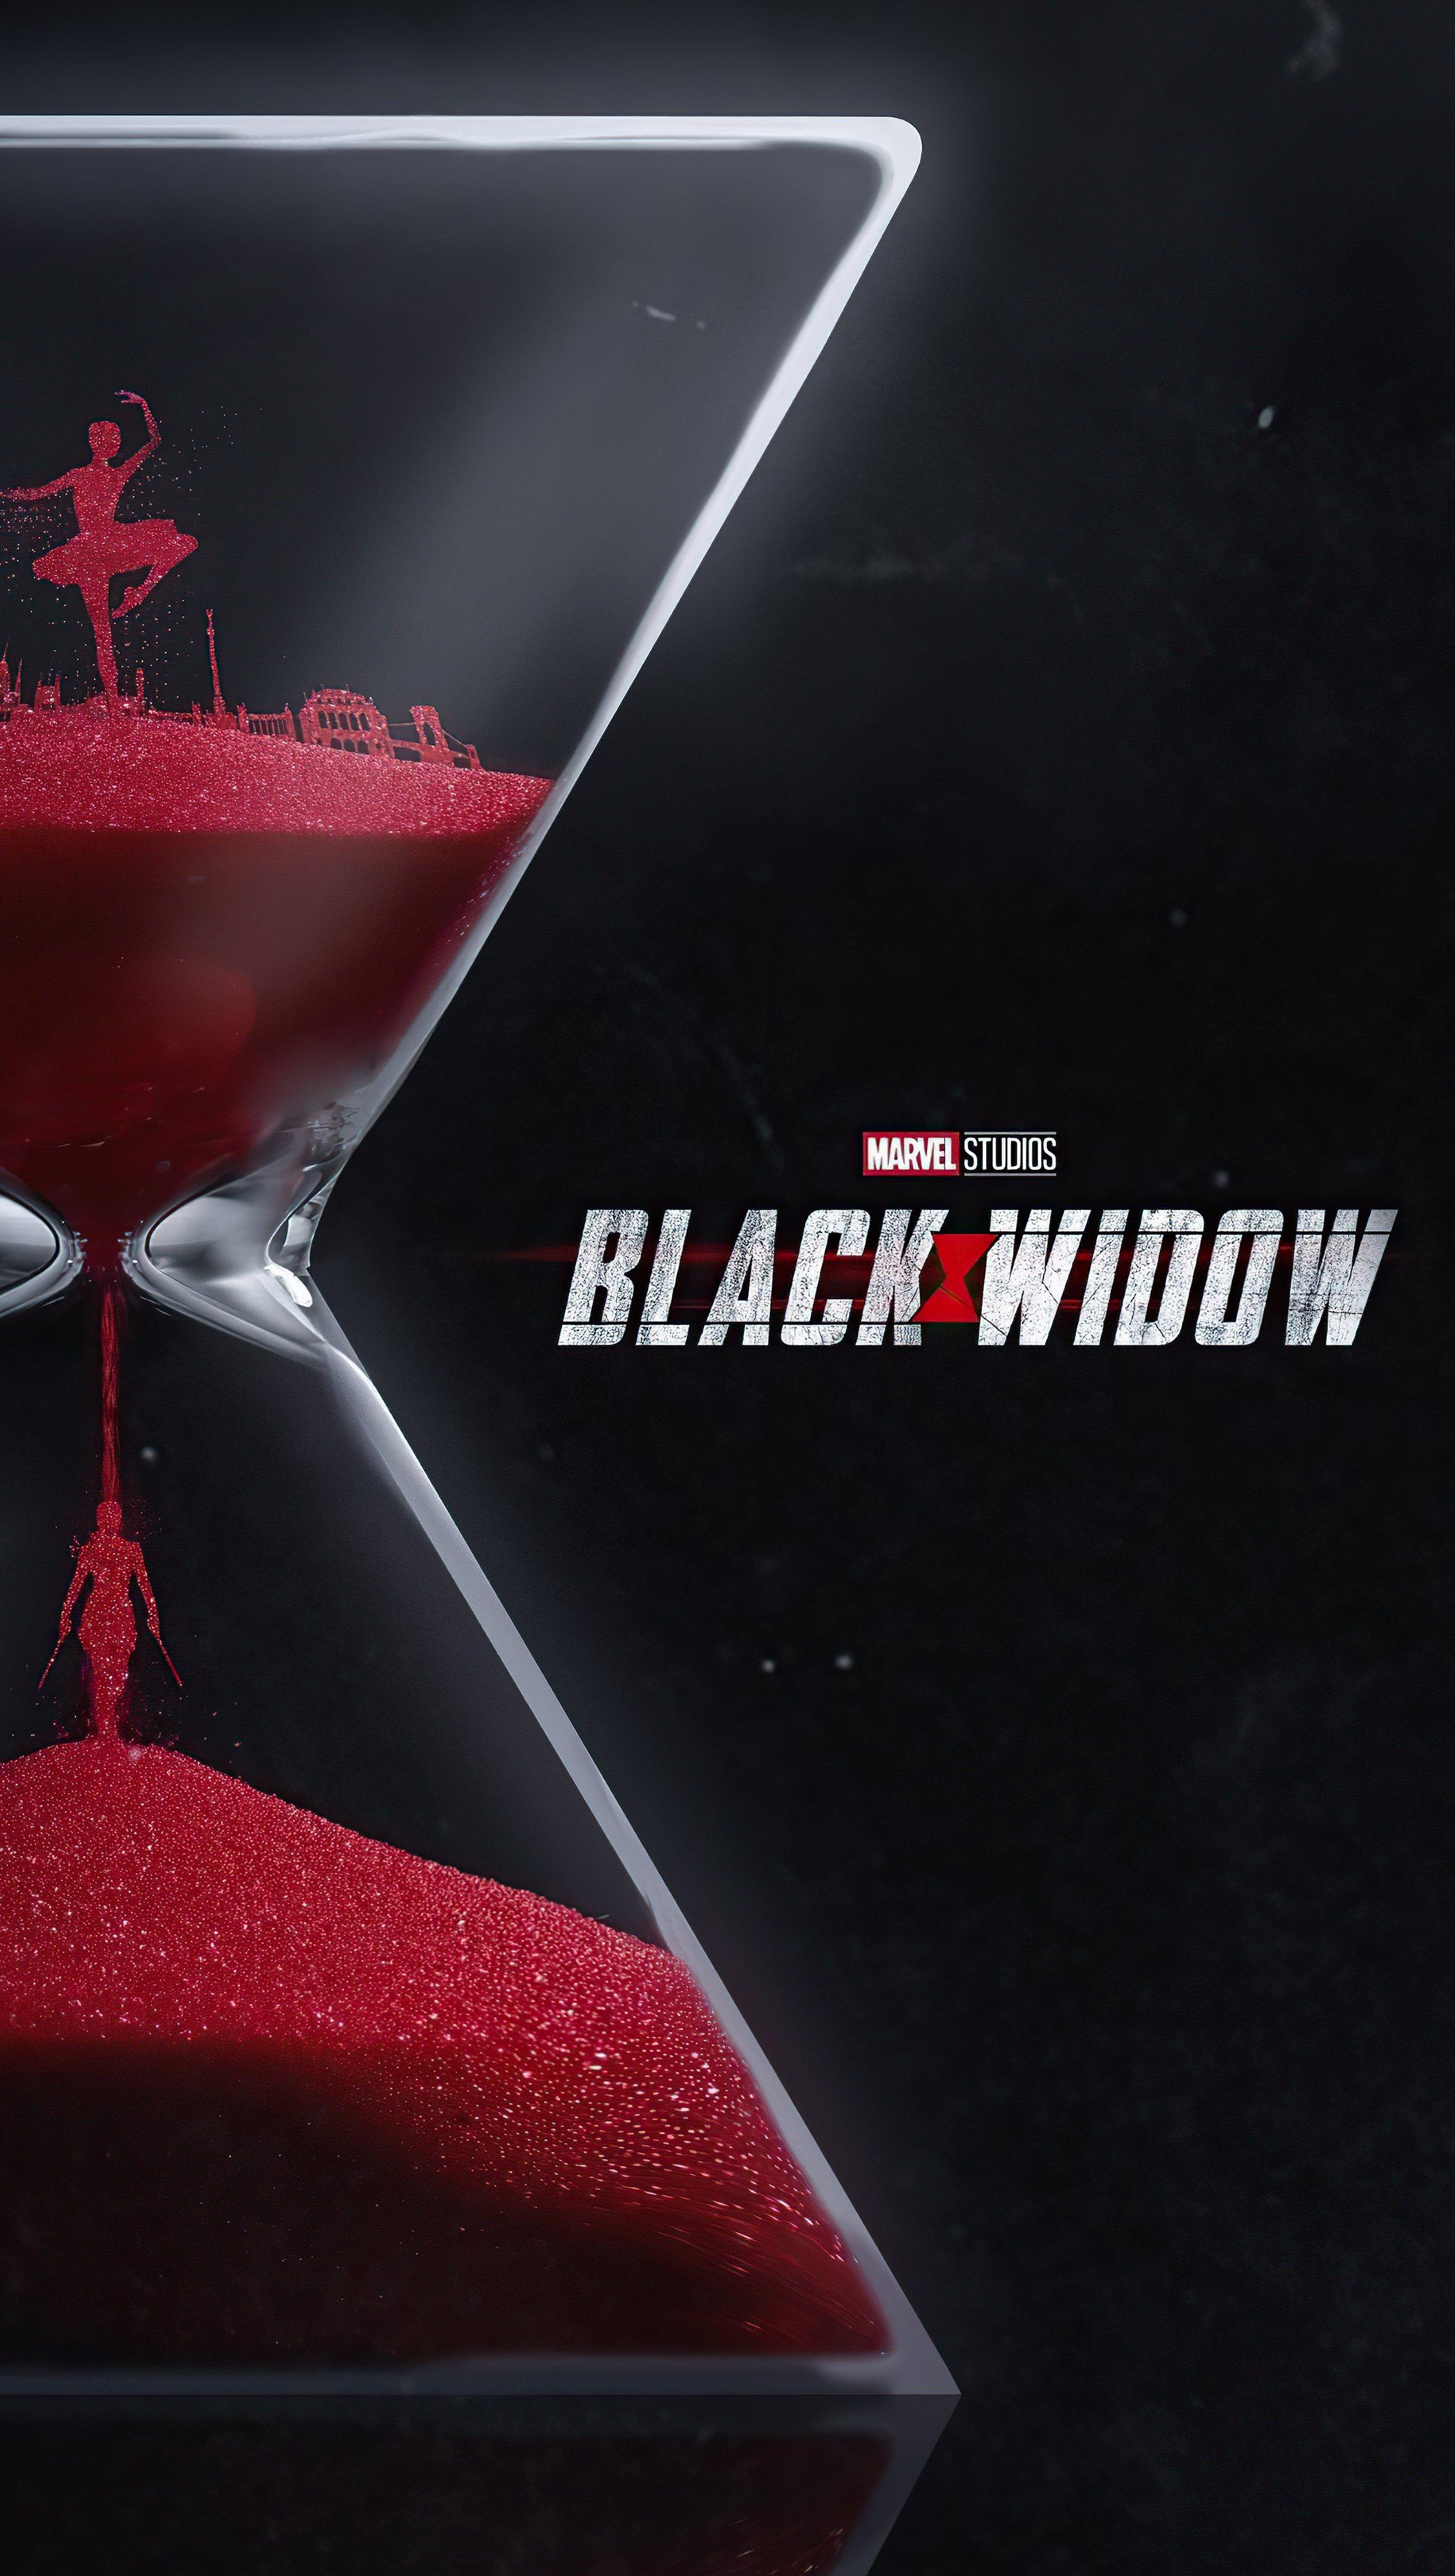 Wallpaper Hourglass Black Widow Vertical